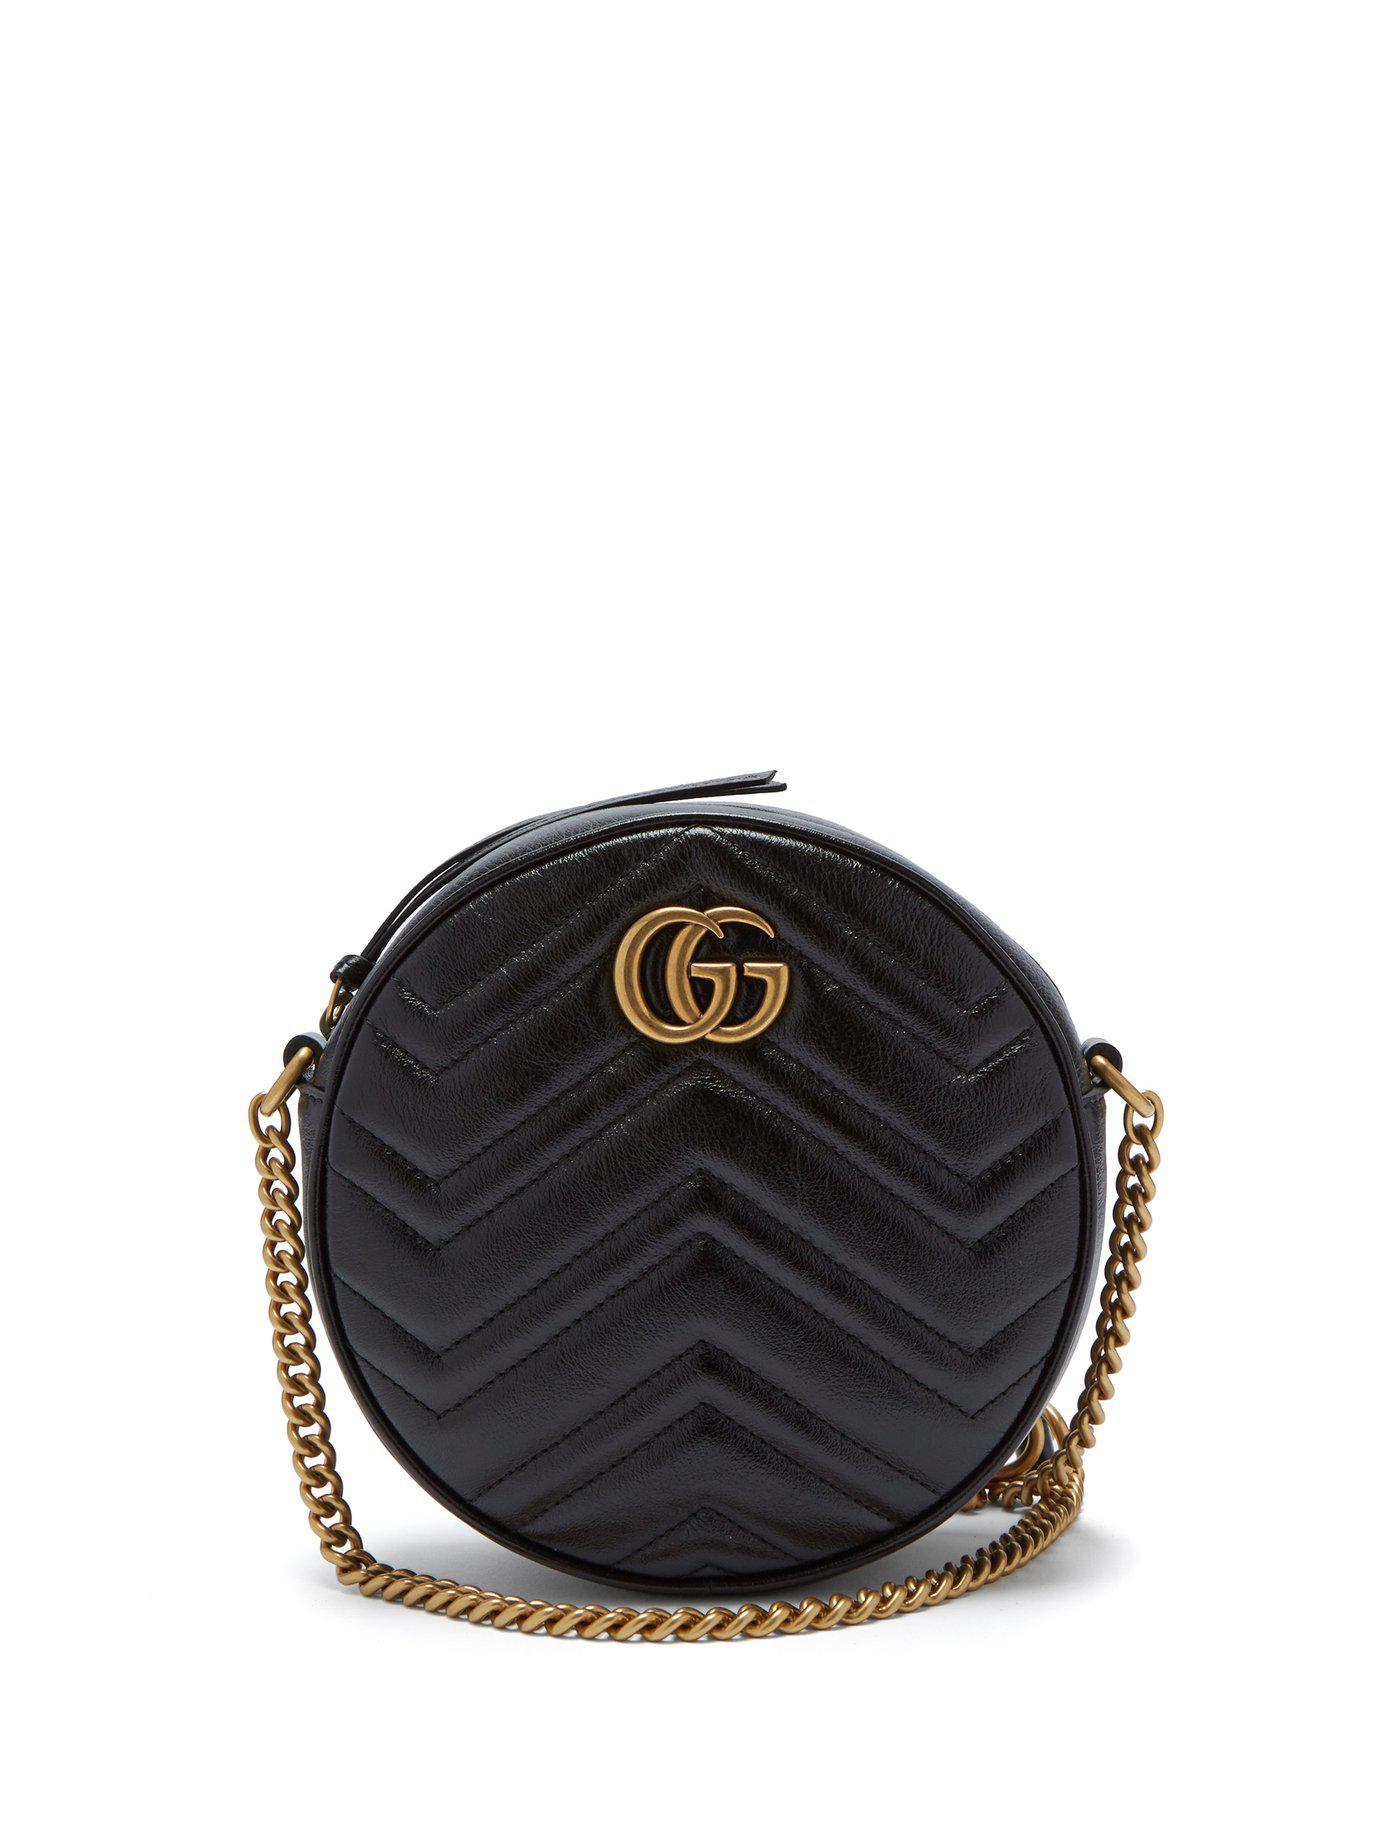 661b8884b78 Lyst - Gucci Gg Marmont Circular Leather Cross Body Bag in Black ...